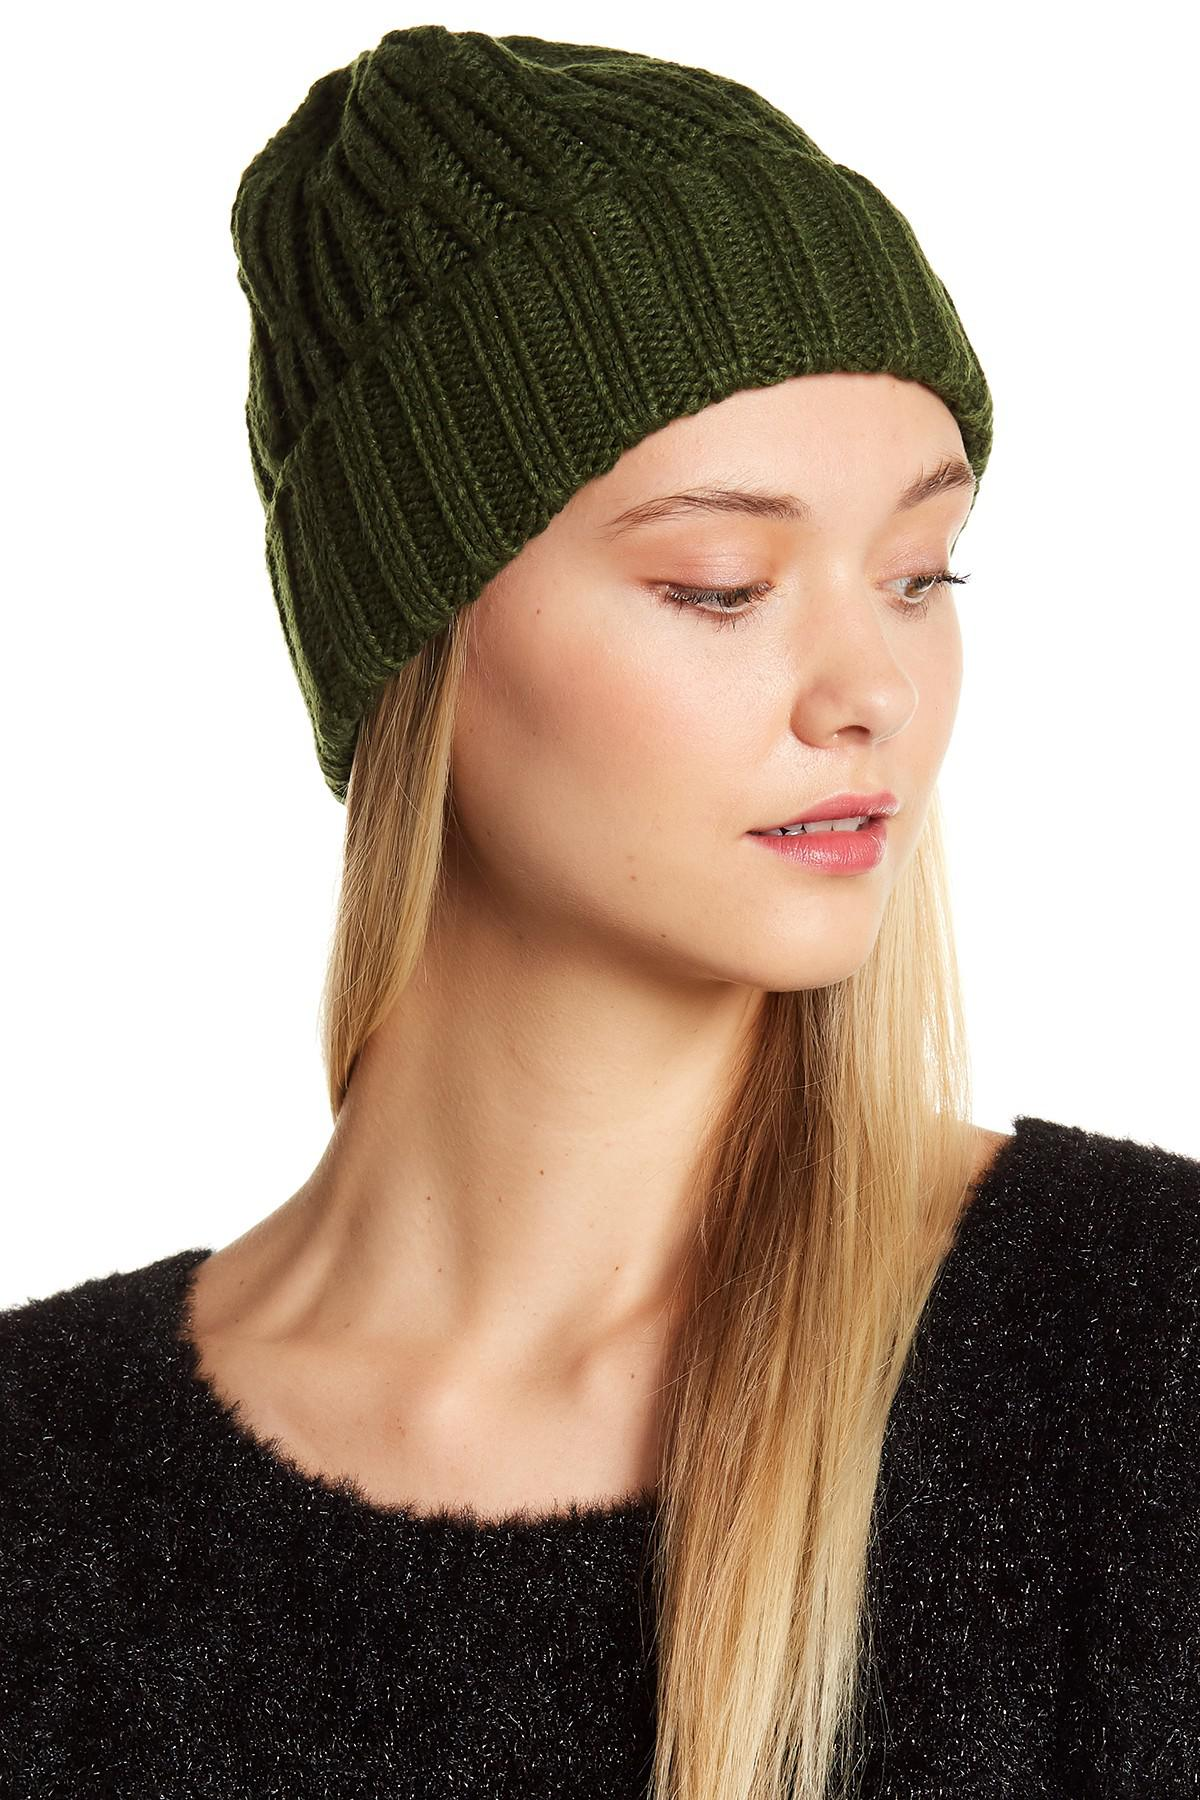 Lyst - MICHAEL Michael Kors Ribbed Cable Kit Cuffed Hat d7d044d3192